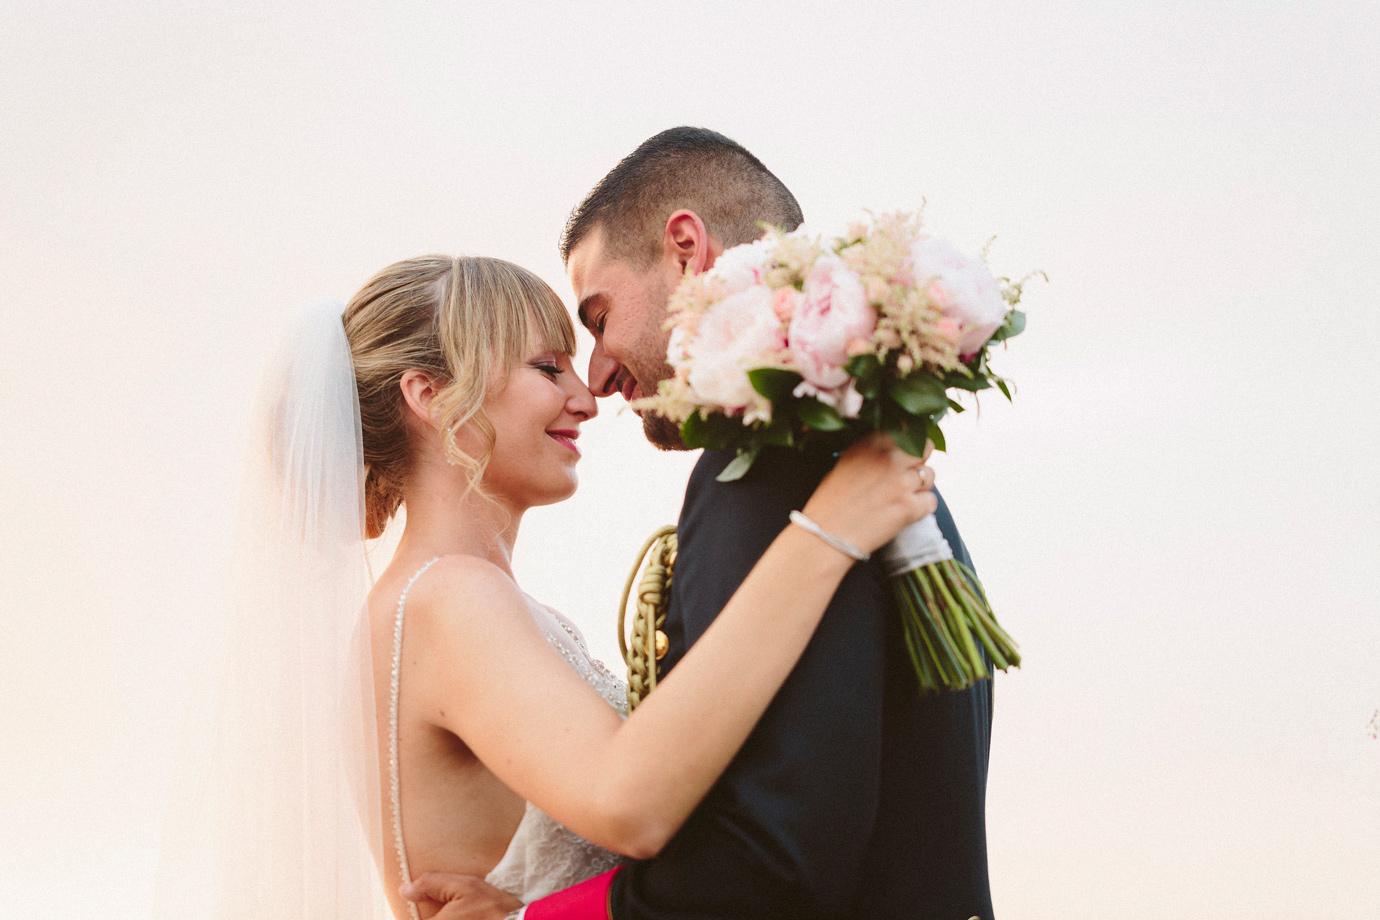 fotografo de bodas en malaga archidona granada madrid alhambra princesa ramos de novia